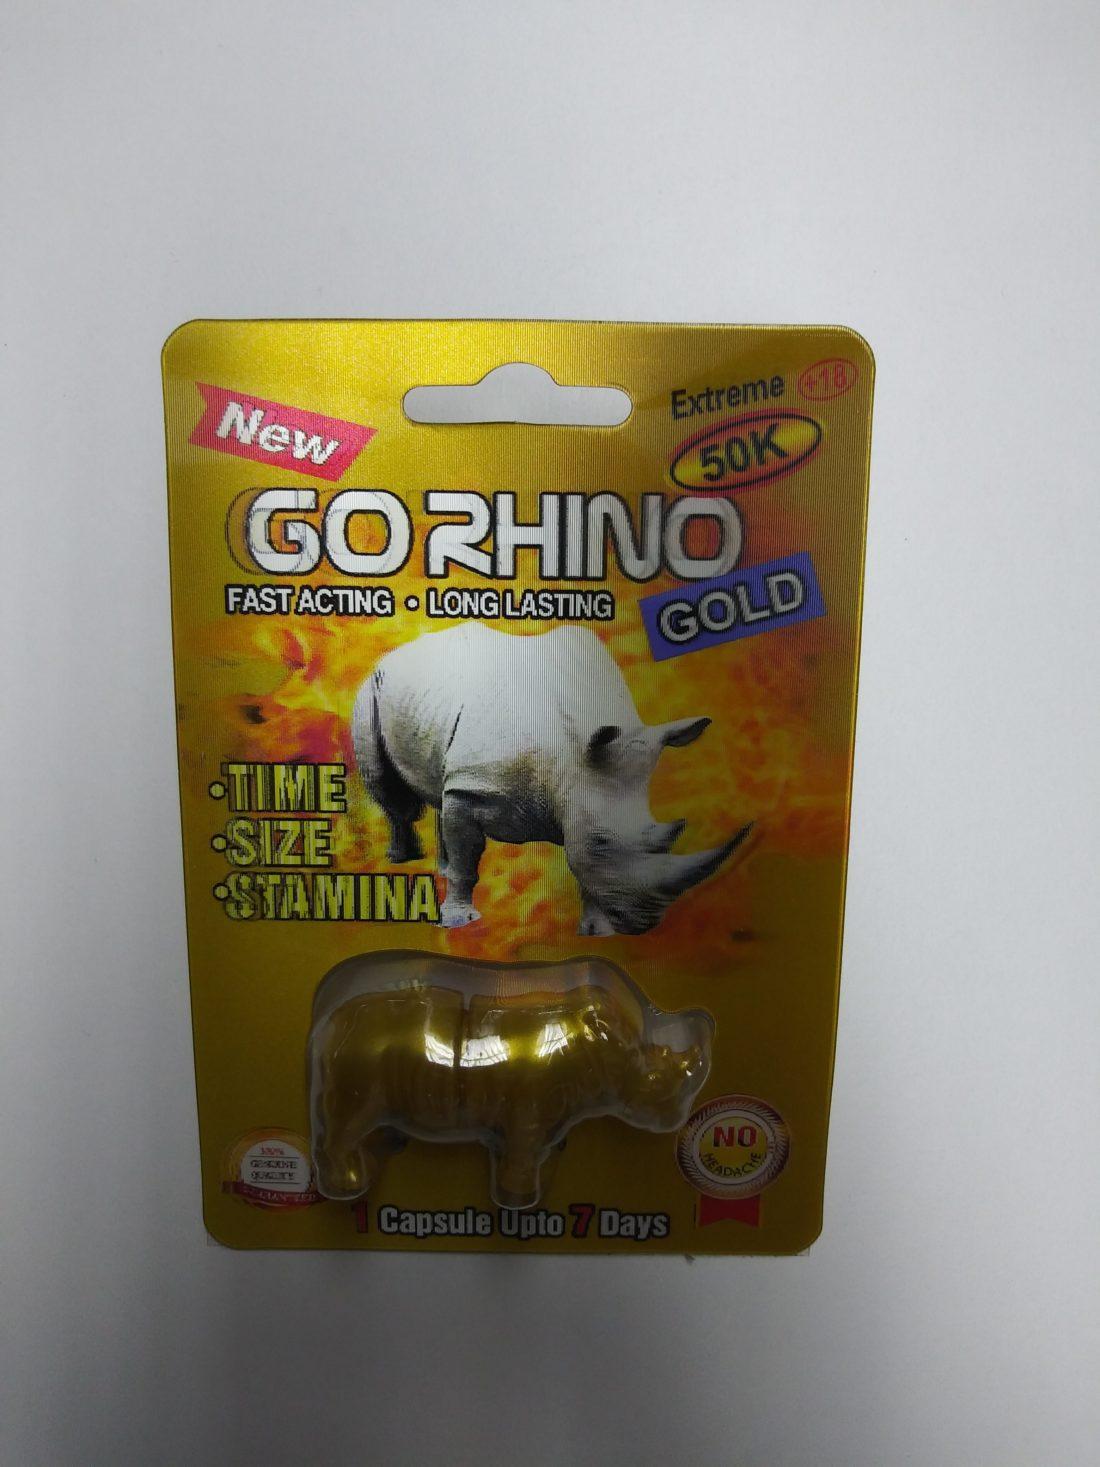 24 Count Go Rhino Gold 50k Male Sexual Enhancement Pills